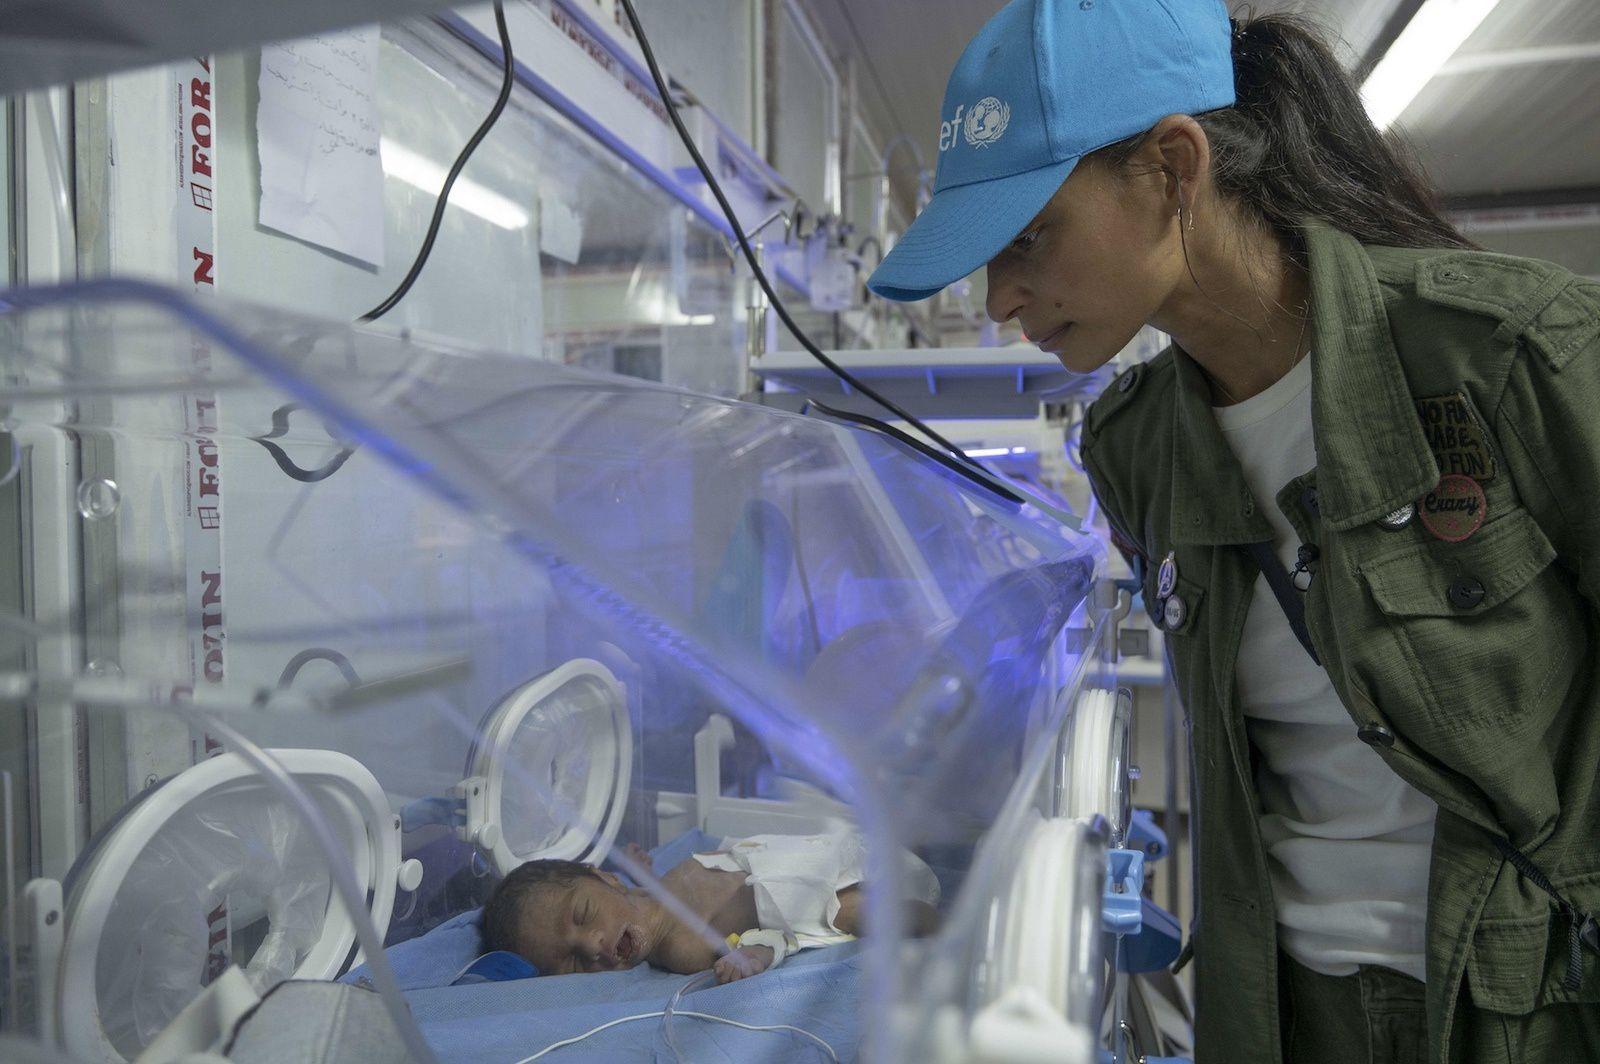 Tatiana Silva, ambassadrice d'UNICEF, de retour d'une mission humanitaire en Irak.